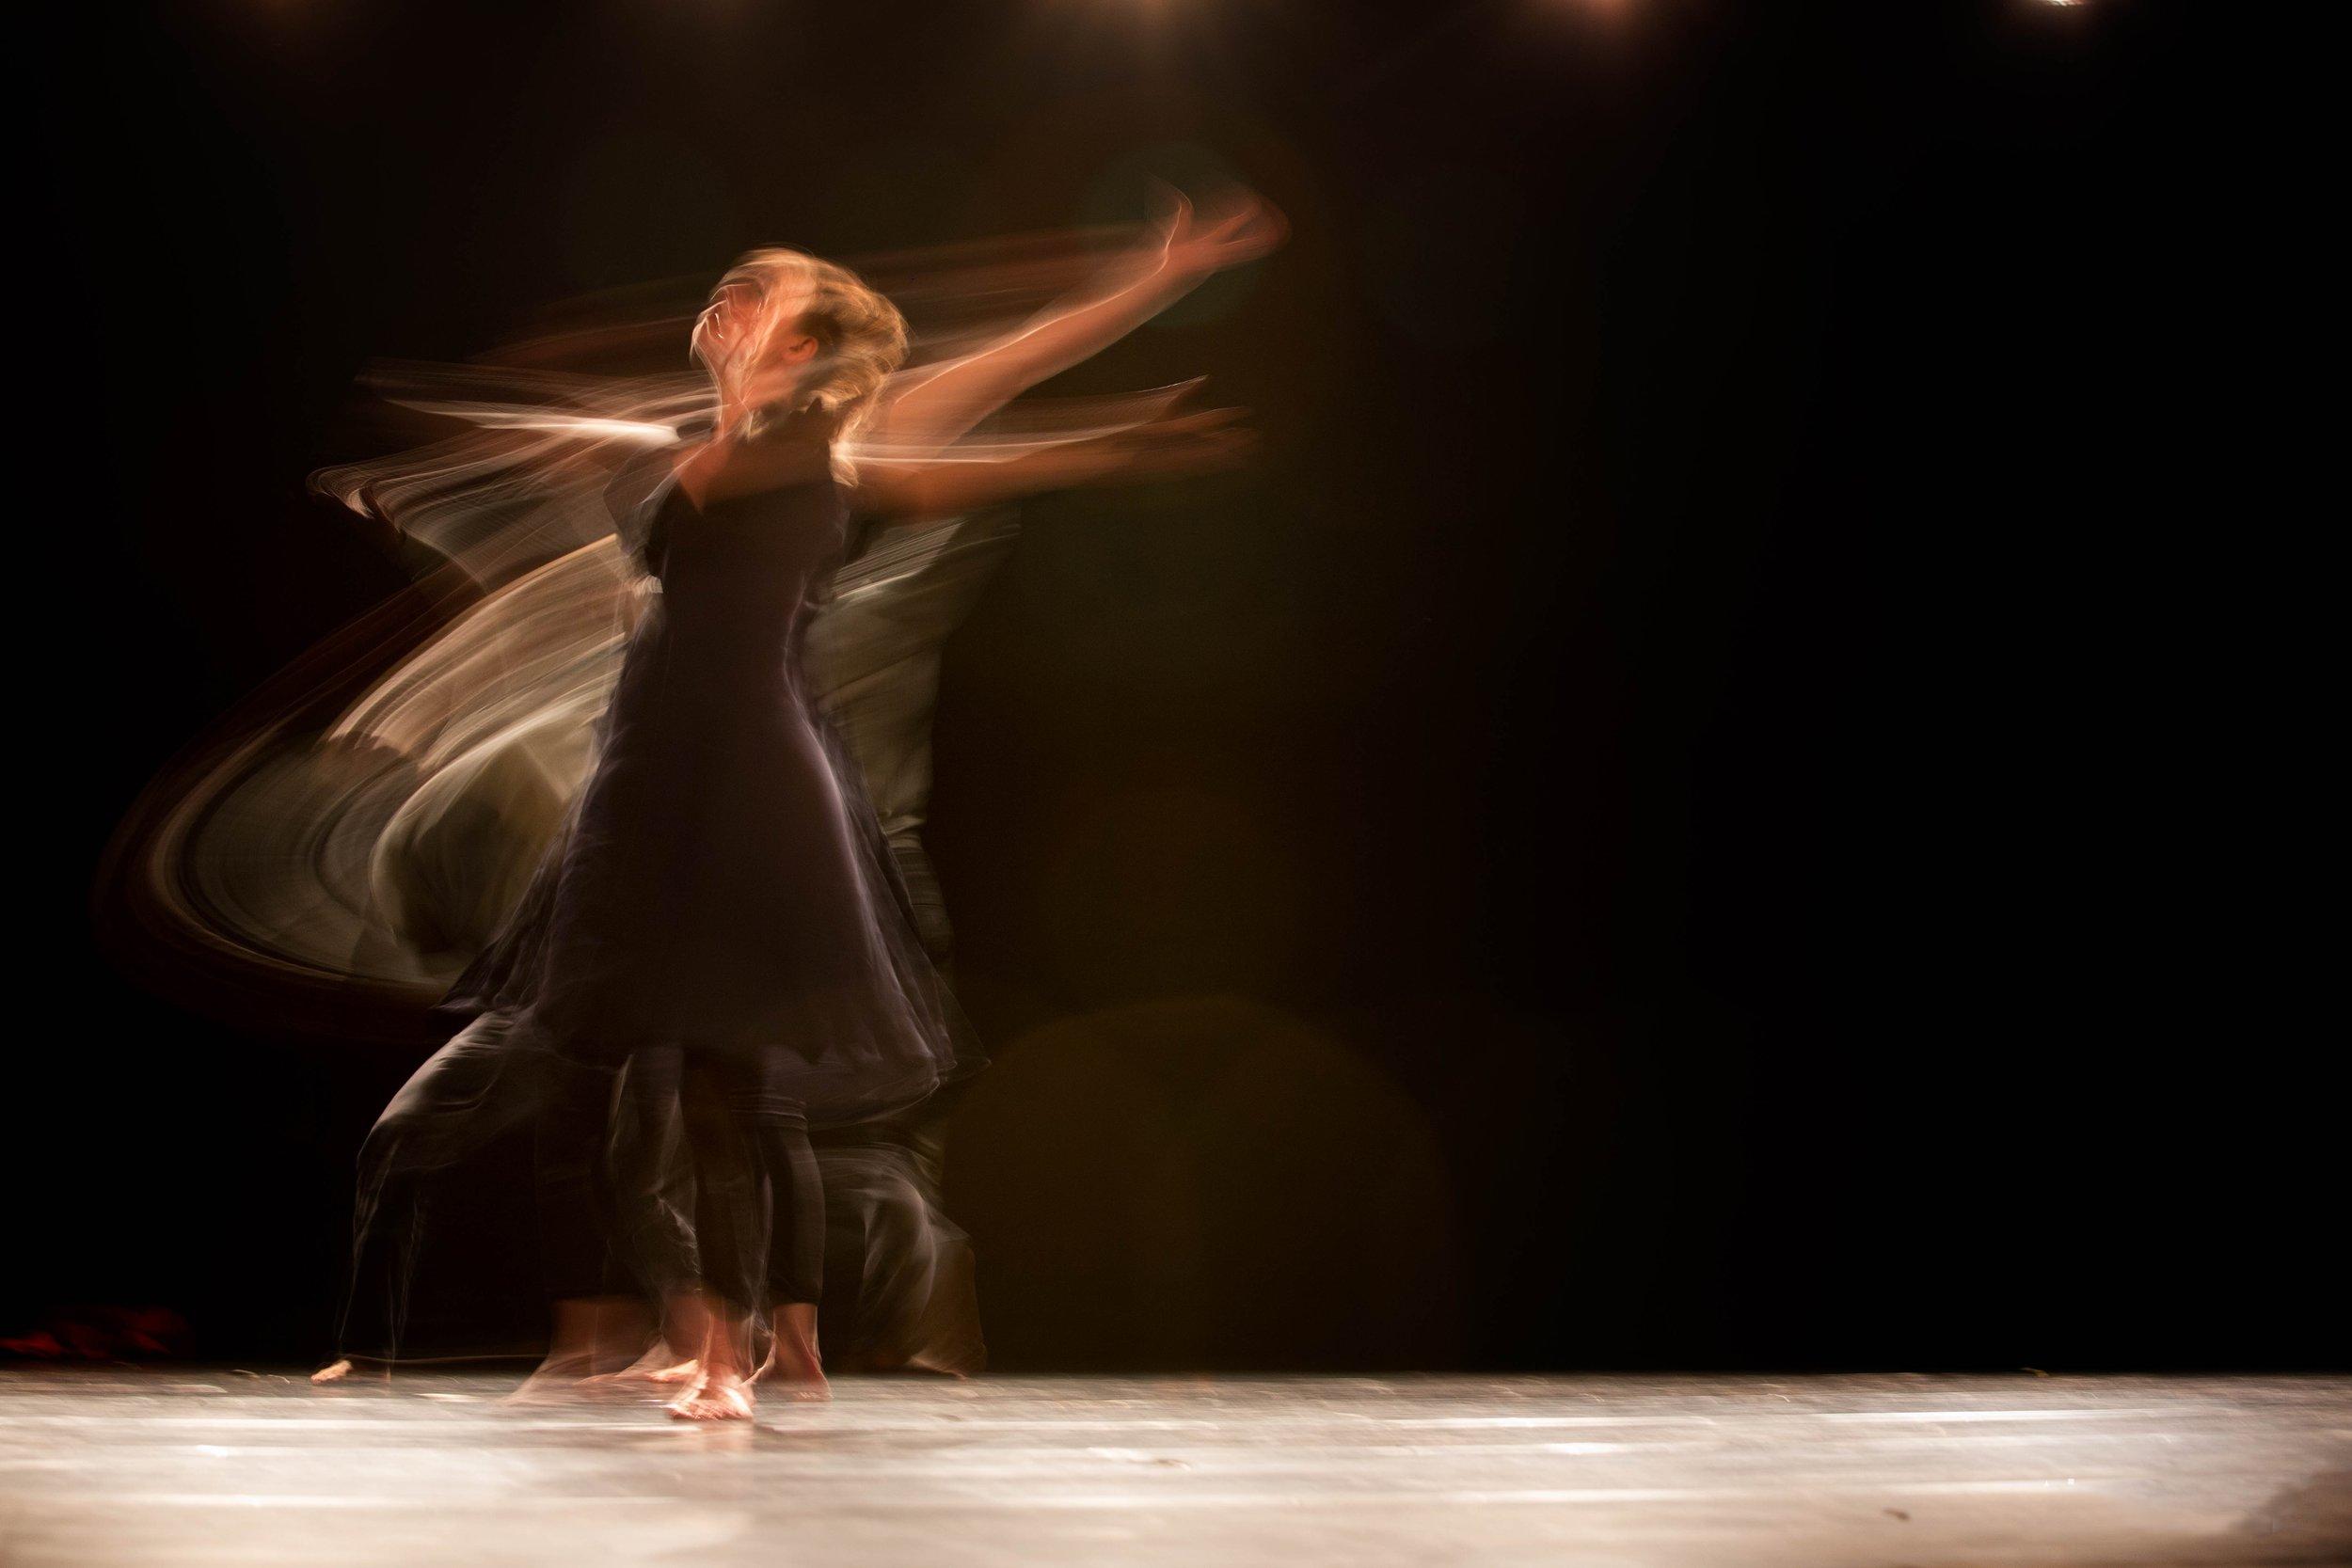 ahmad-odeh-dance_spin_unsplash.jpg